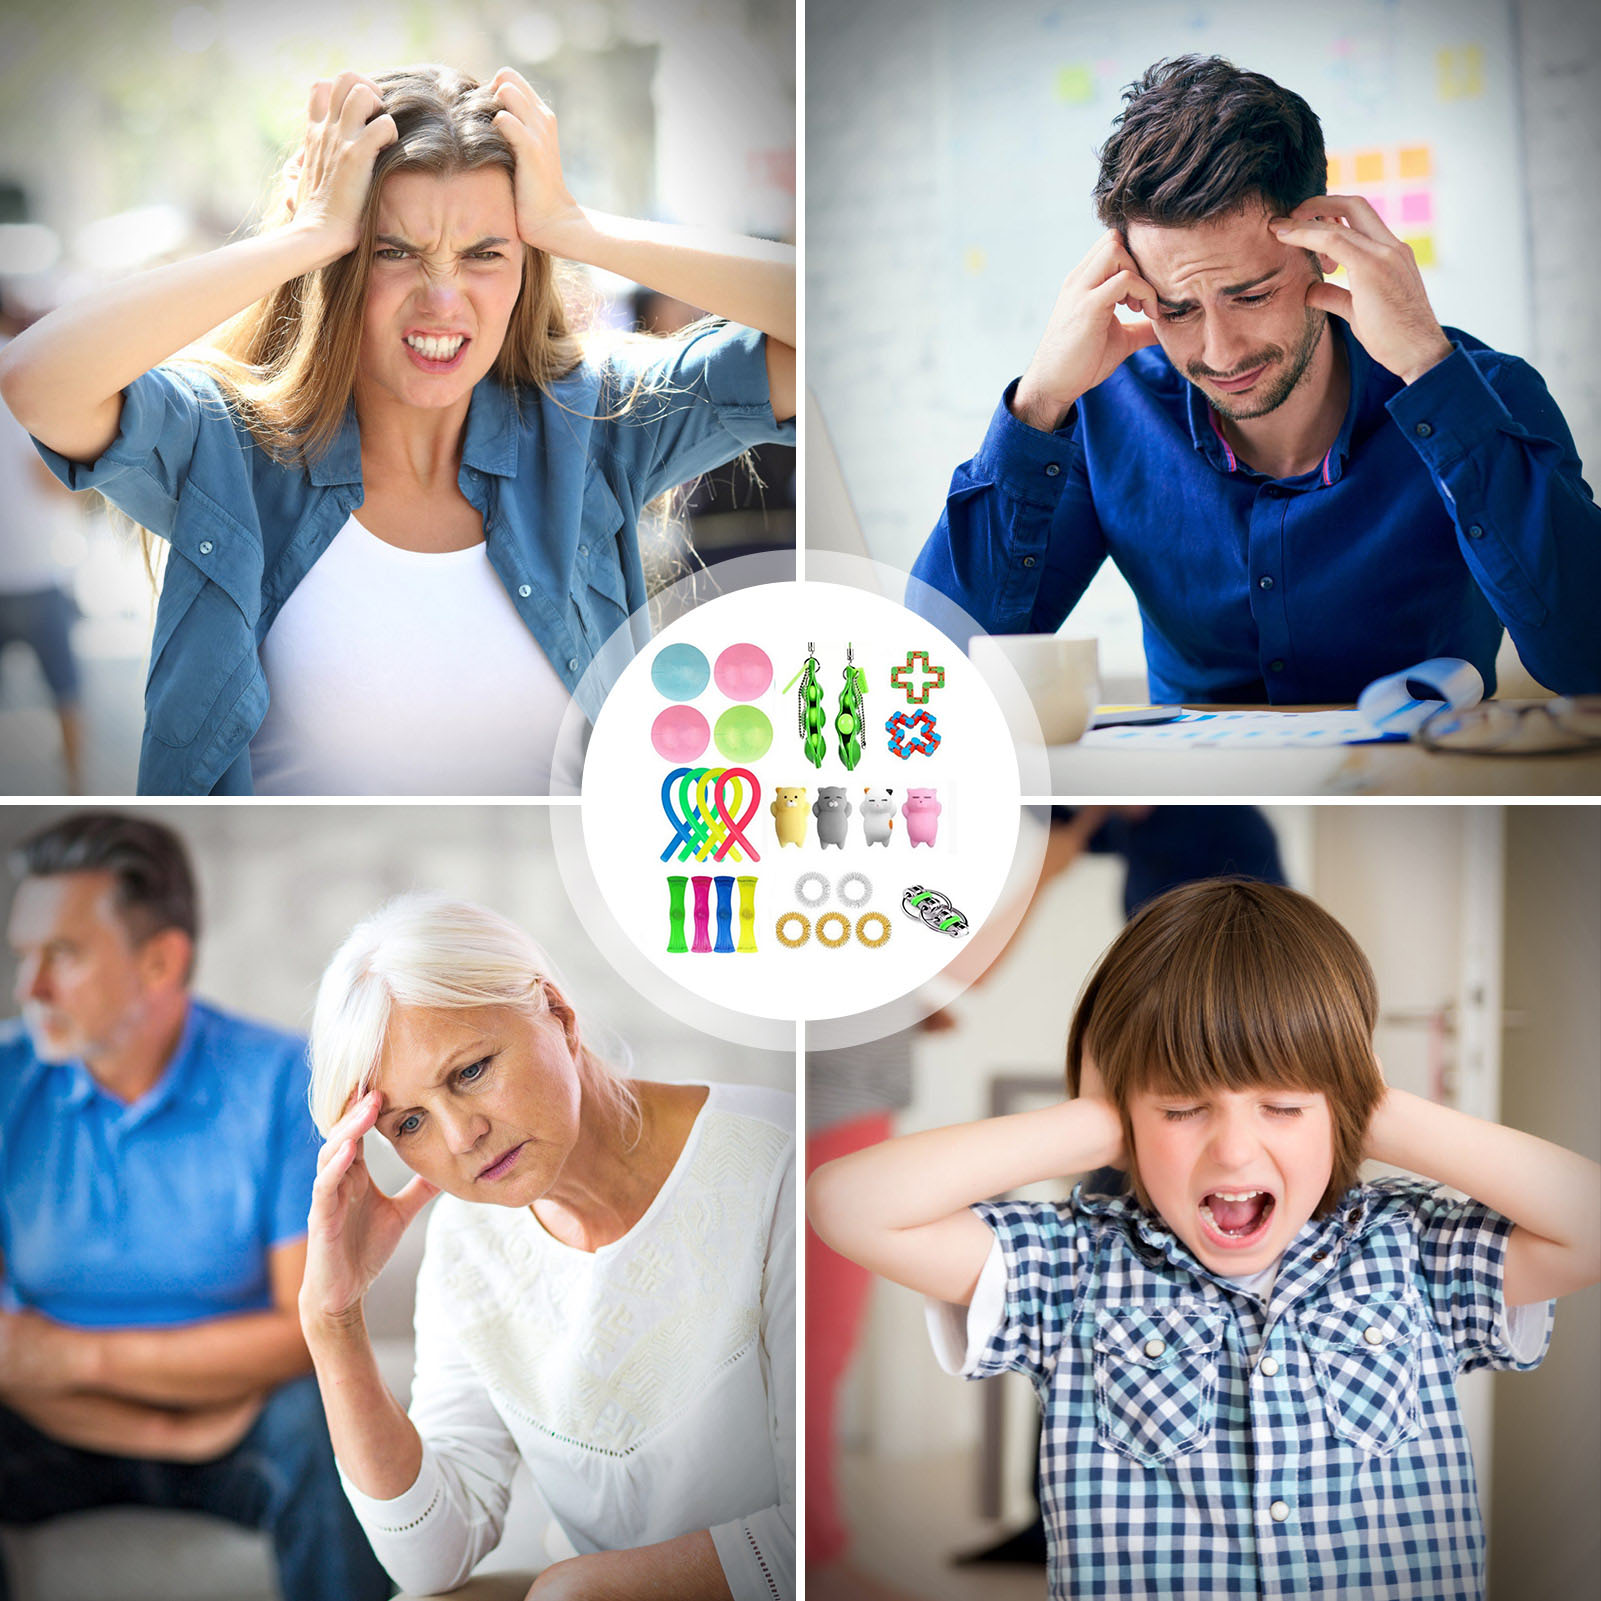 26PCS Fidget Push Pops Bubble Sensory Toy For Autism Stress Reliever Toys Adult Kid Funny Anti-stress Kids Toys enlarge